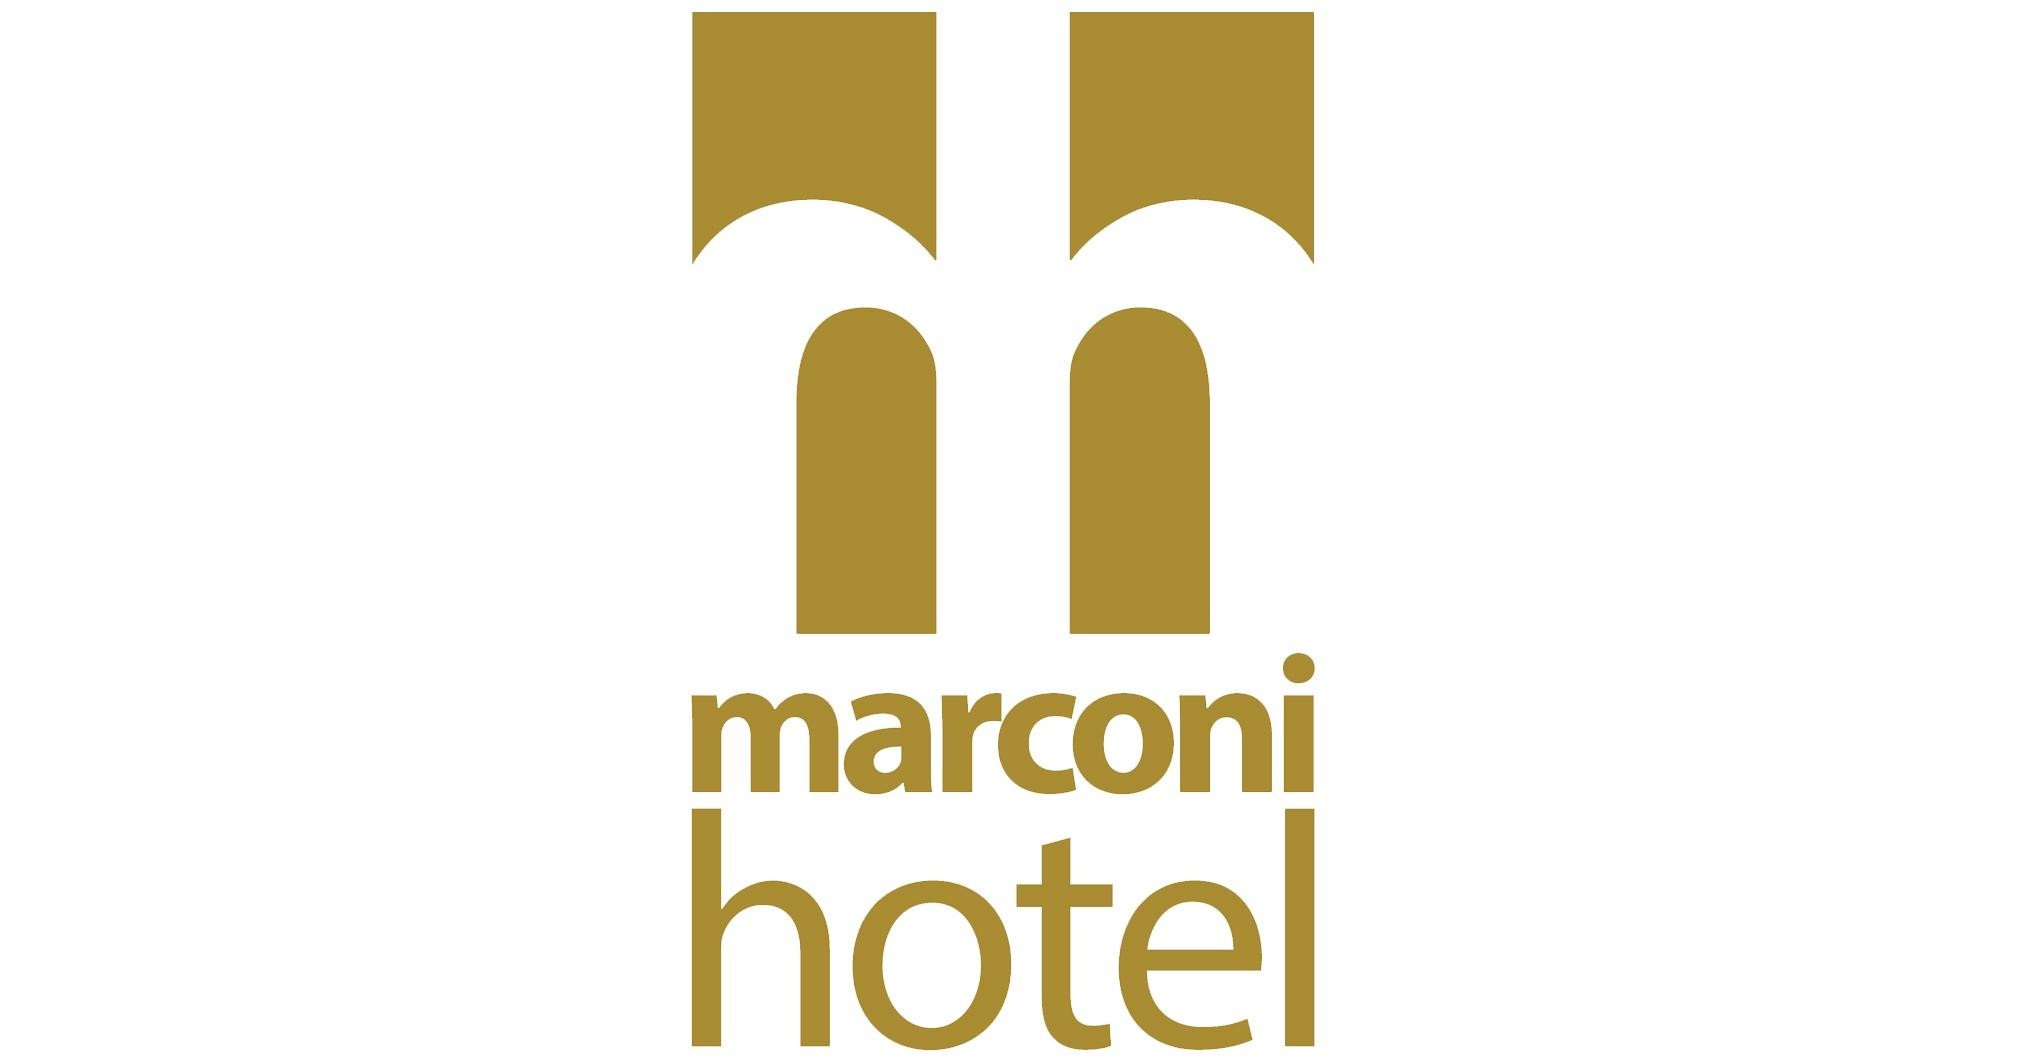 Marconi.jpg